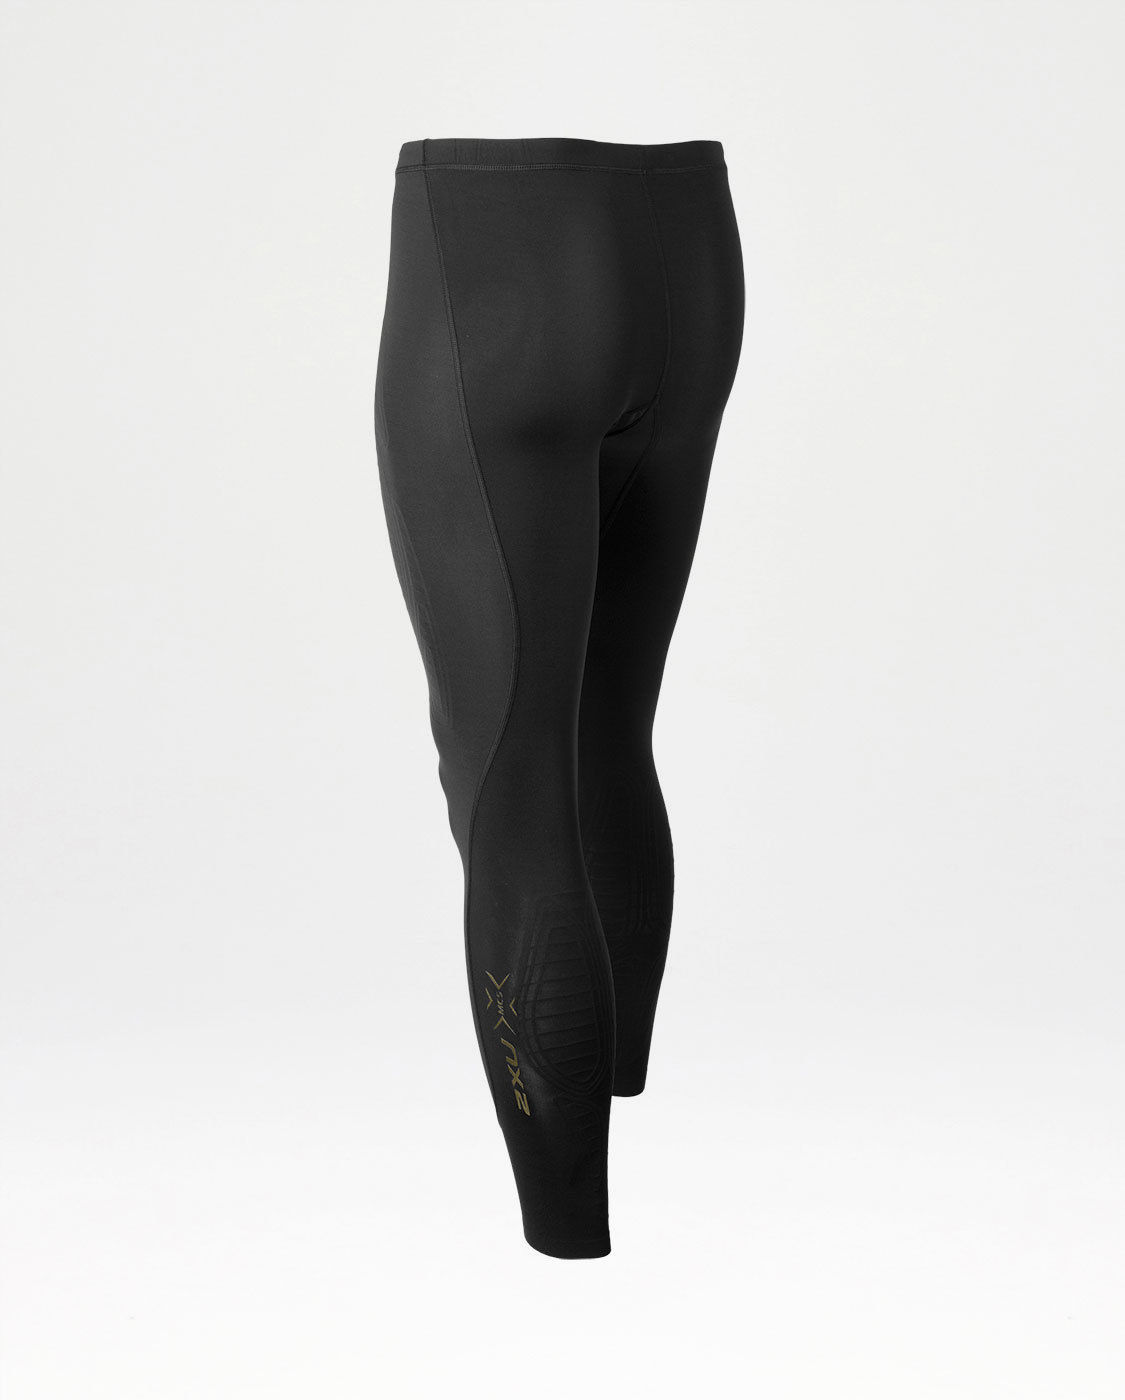 1125x1400 Compression Tights, Pants Amp Leggings For Men 2xu